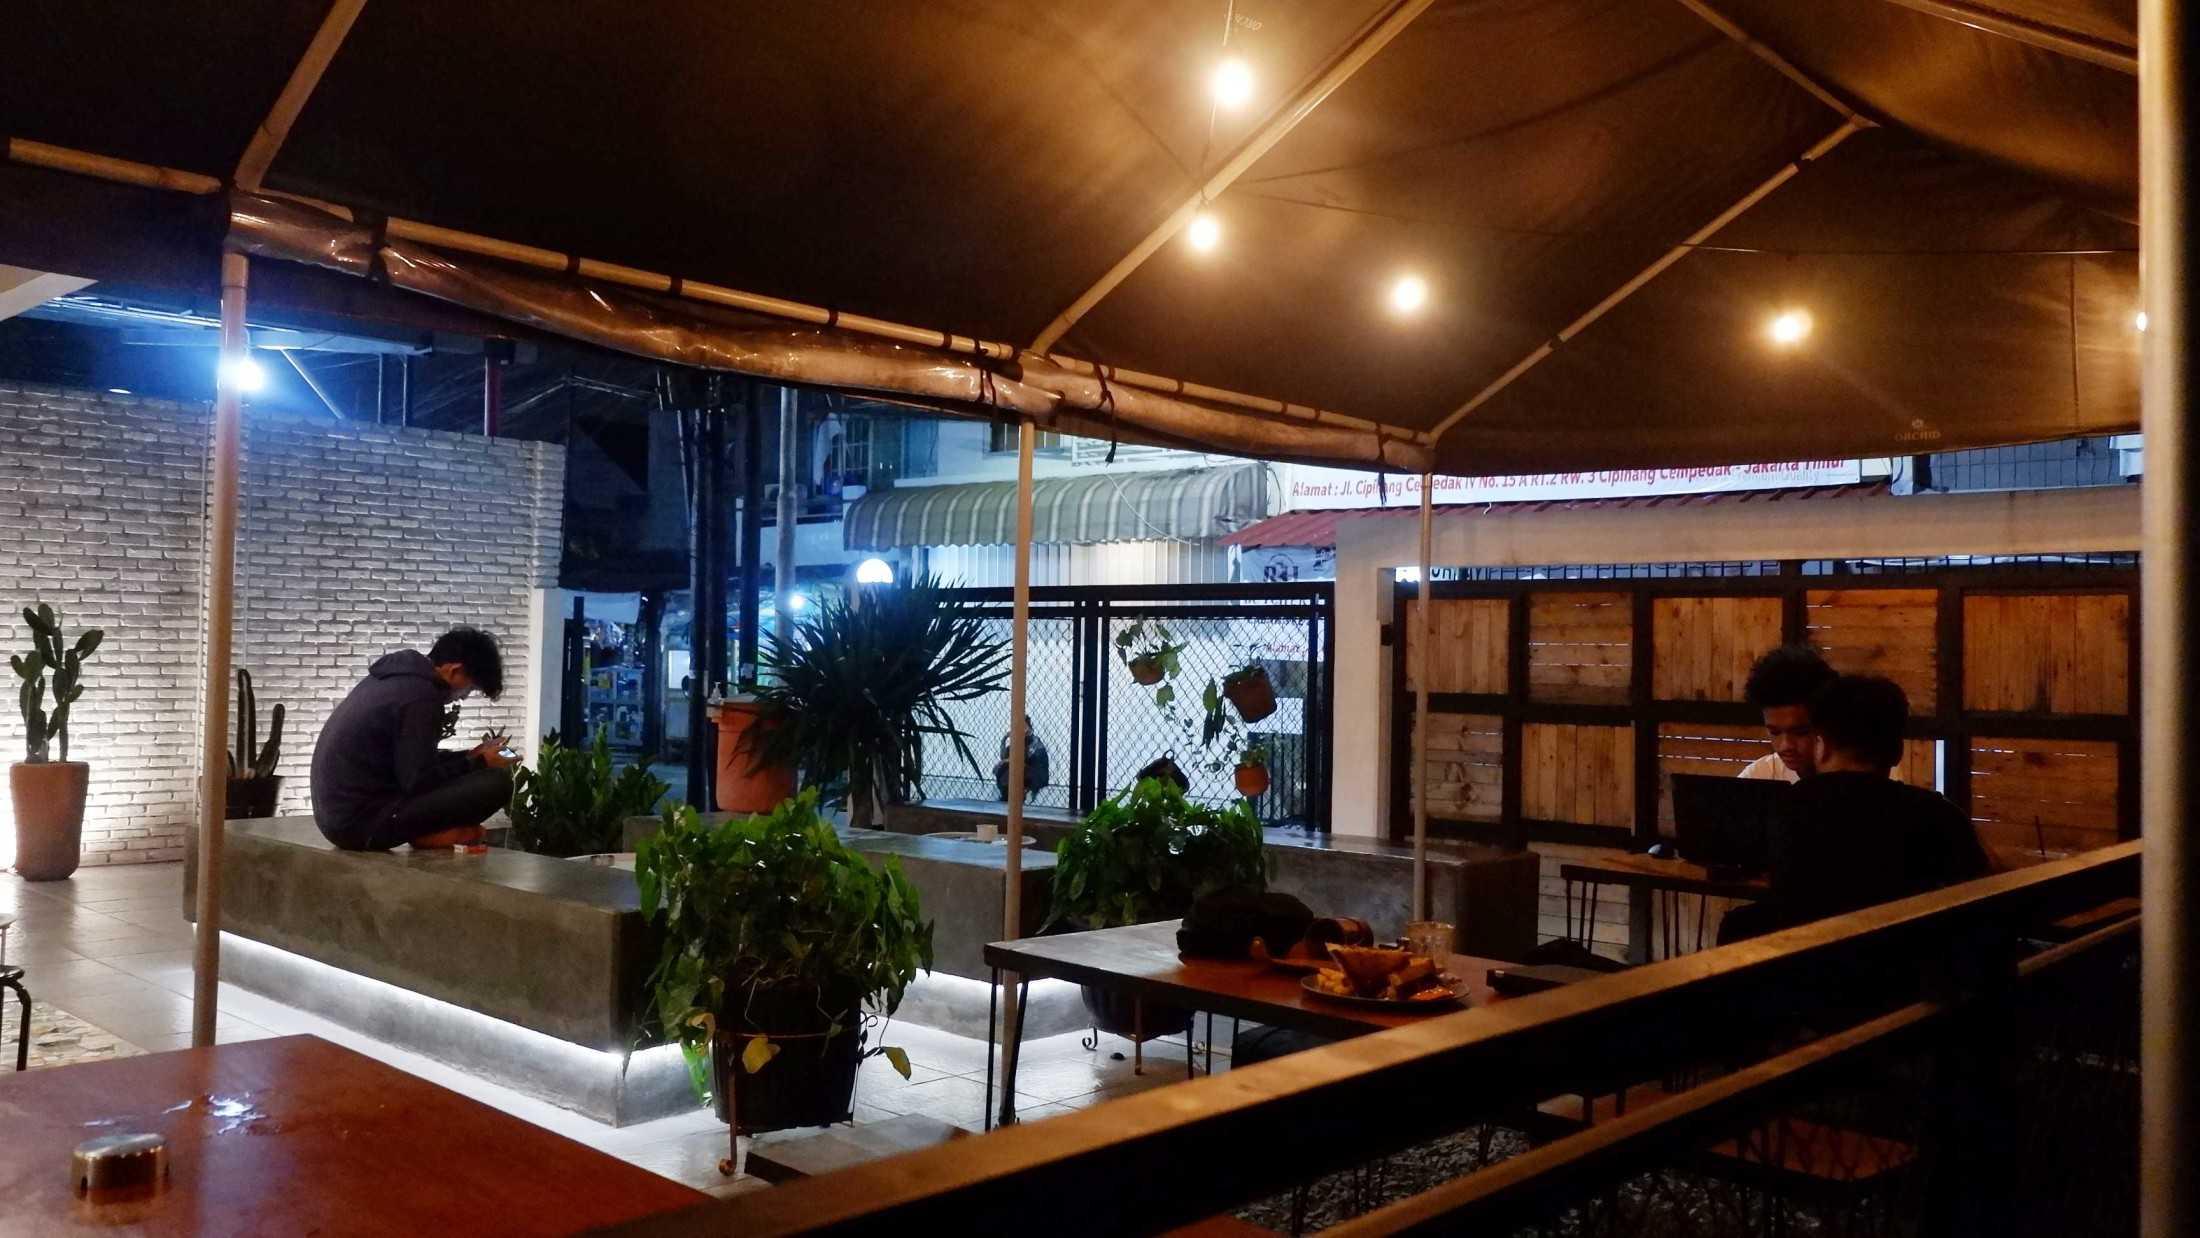 Mads+Partner Saturday Coffee 2.0 Jakarta Timur, Kota Jakarta Timur, Daerah Khusus Ibukota Jakarta, Indonesia Jakarta Timur, Kota Jakarta Timur, Daerah Khusus Ibukota Jakarta, Indonesia Madspartners-Saturday-Coffee-20  124565